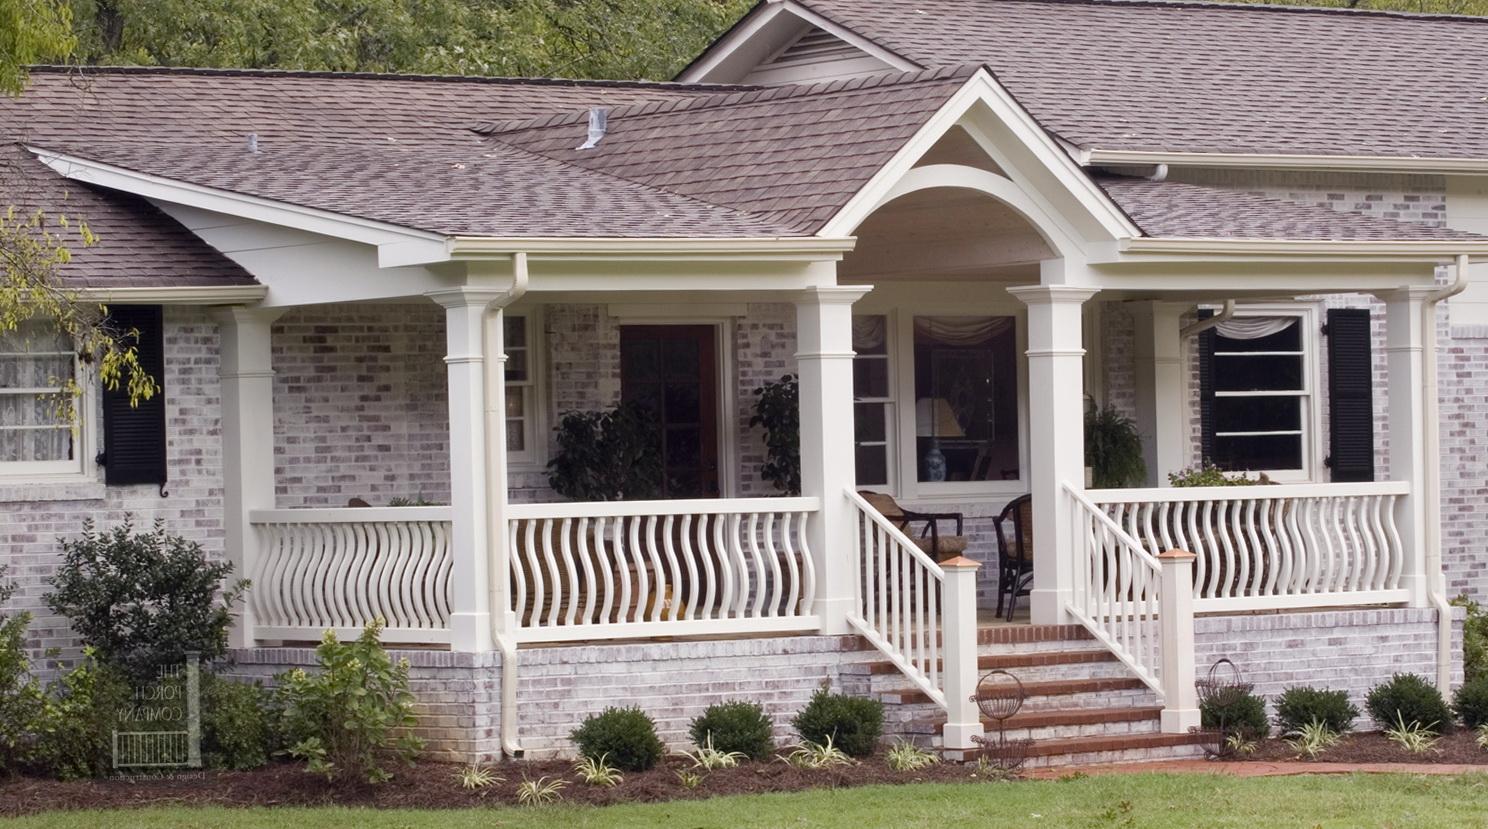 Flat Roof Design Ideas: Flat Porch Roof Designs • Porches Ideas